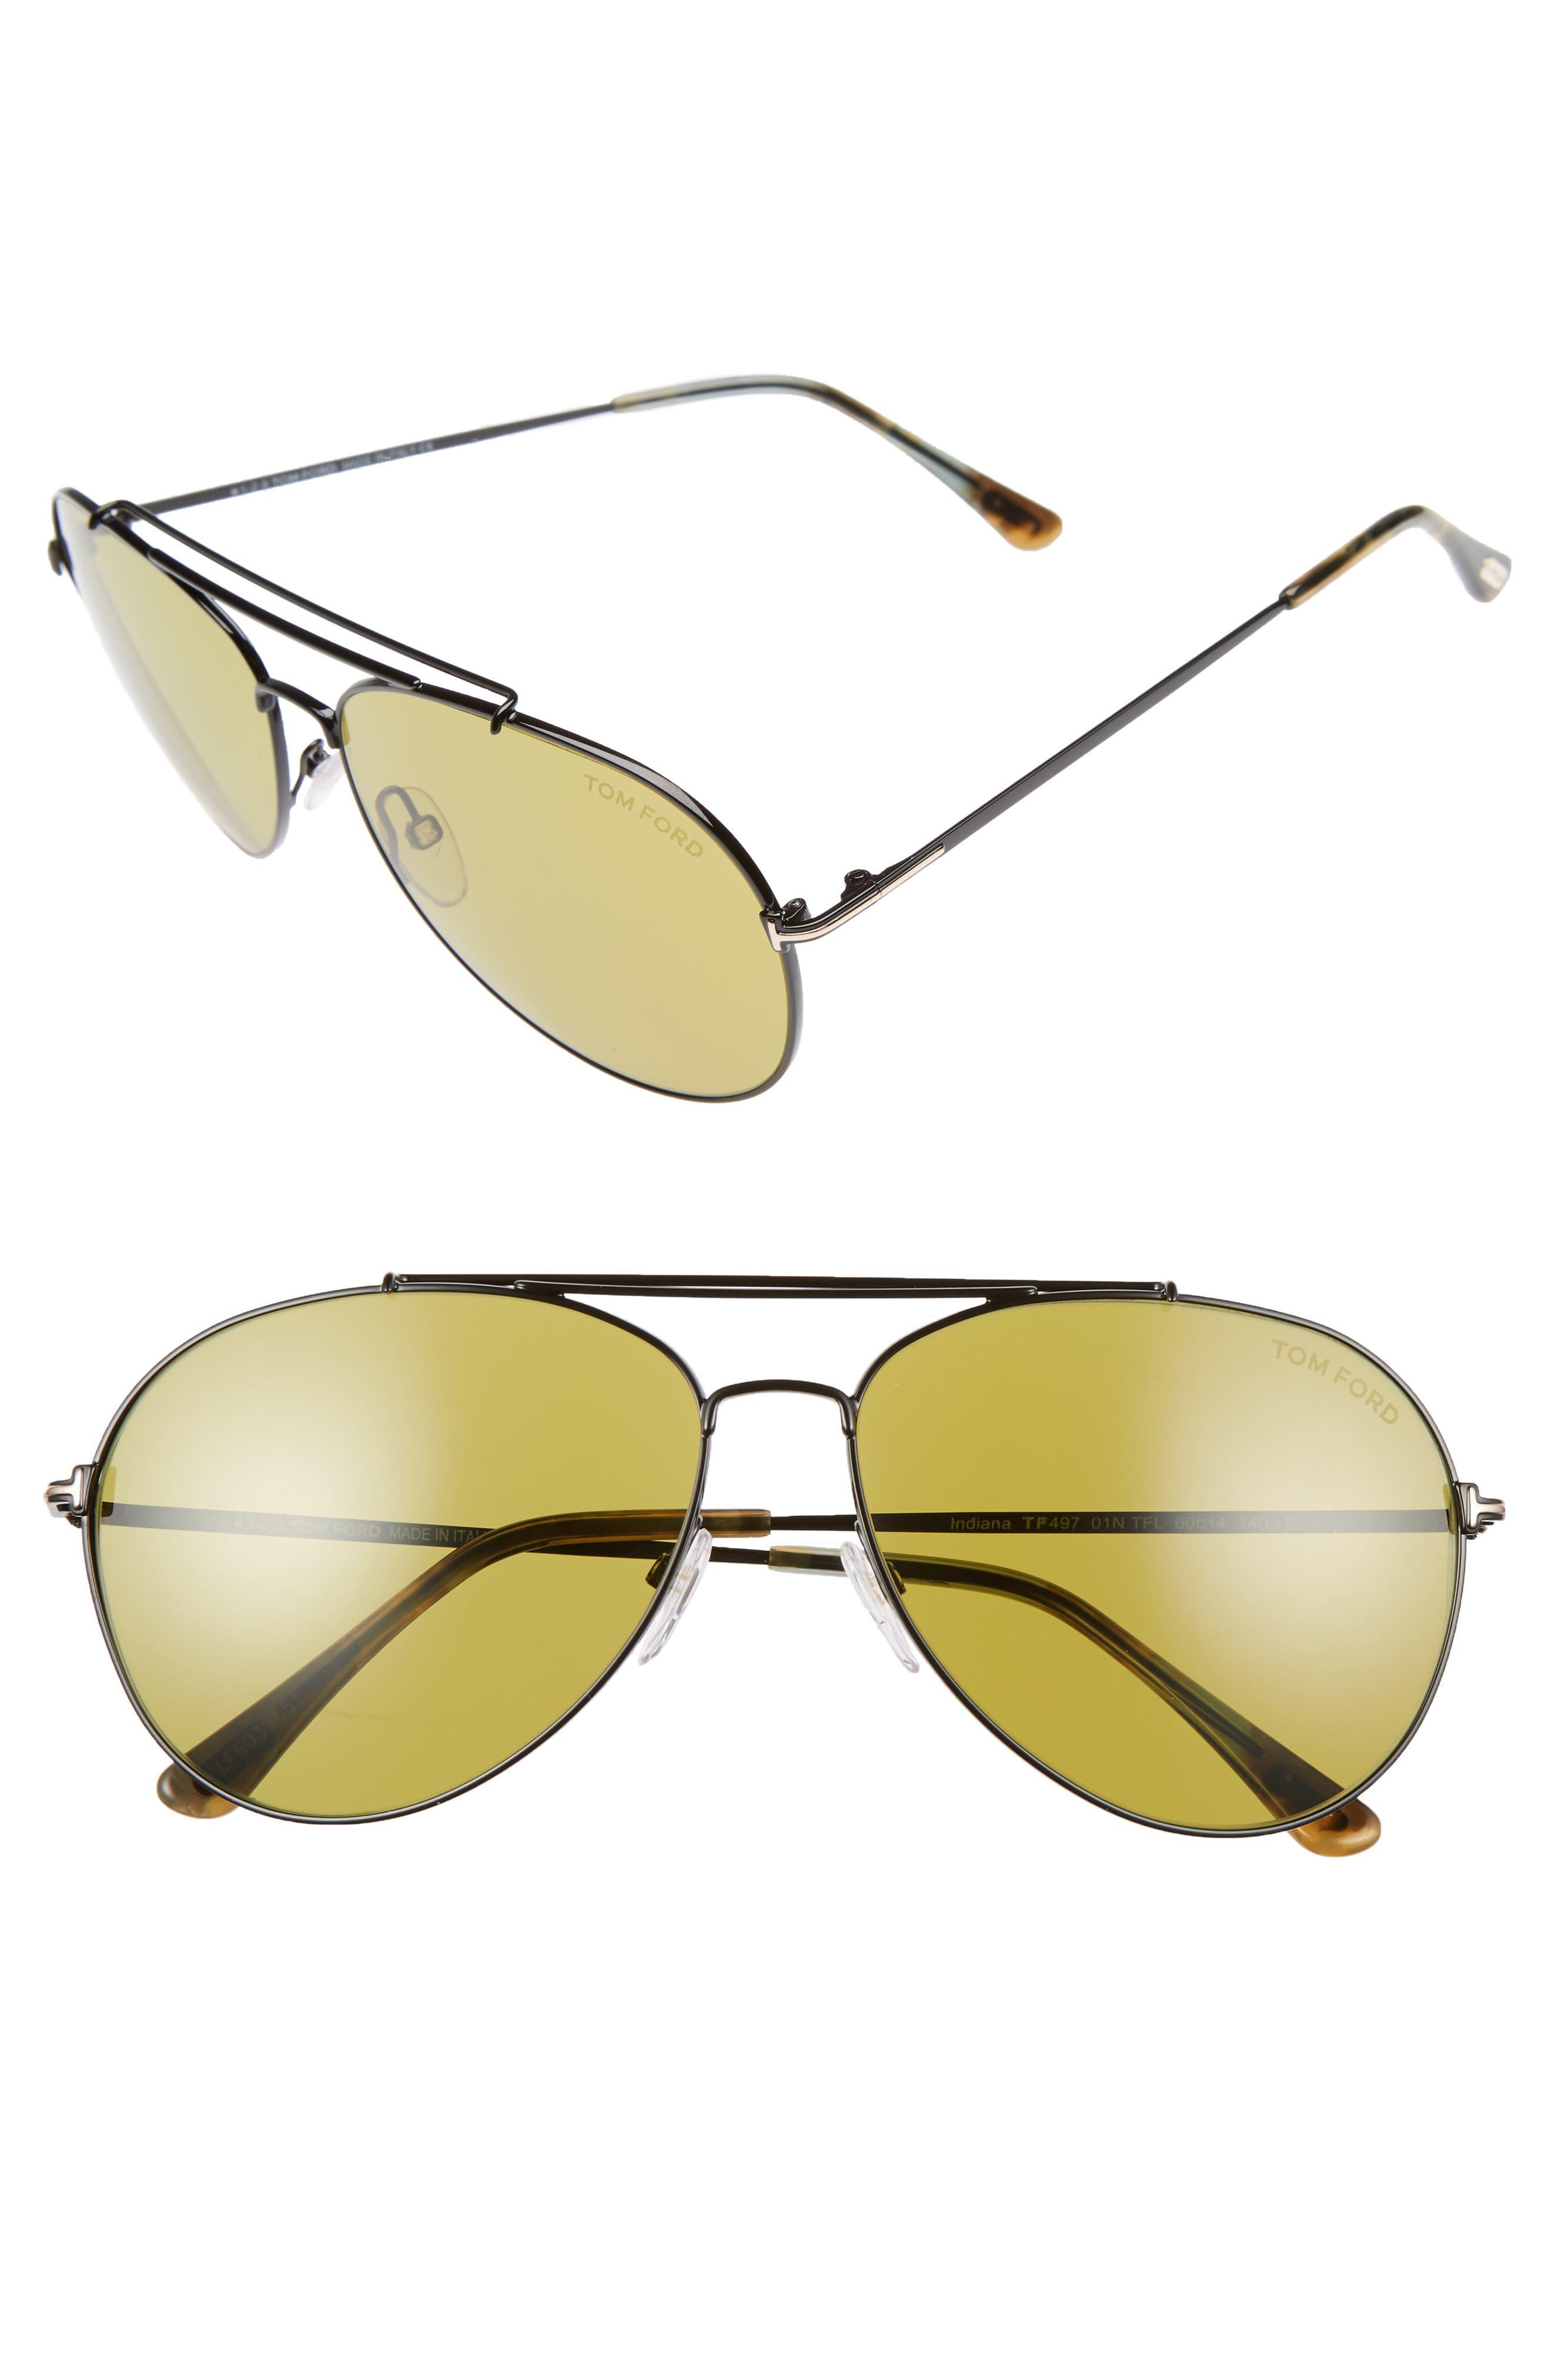 Indiana 58mm Barberini Lens Aviator Sunglasses,                         Main,                         color, Green/ Green Havana/ Black